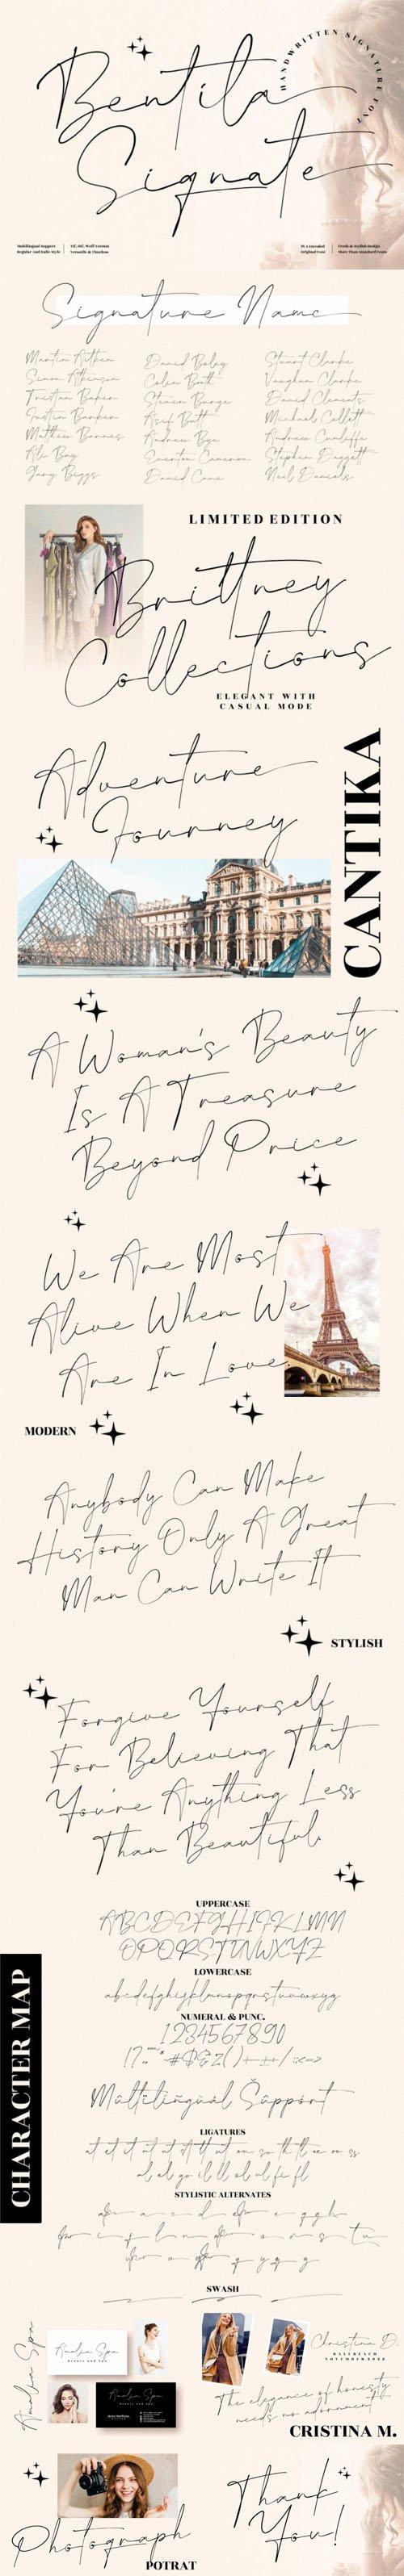 Bentila Signate - Handwritten Signature Font [2-Weights]